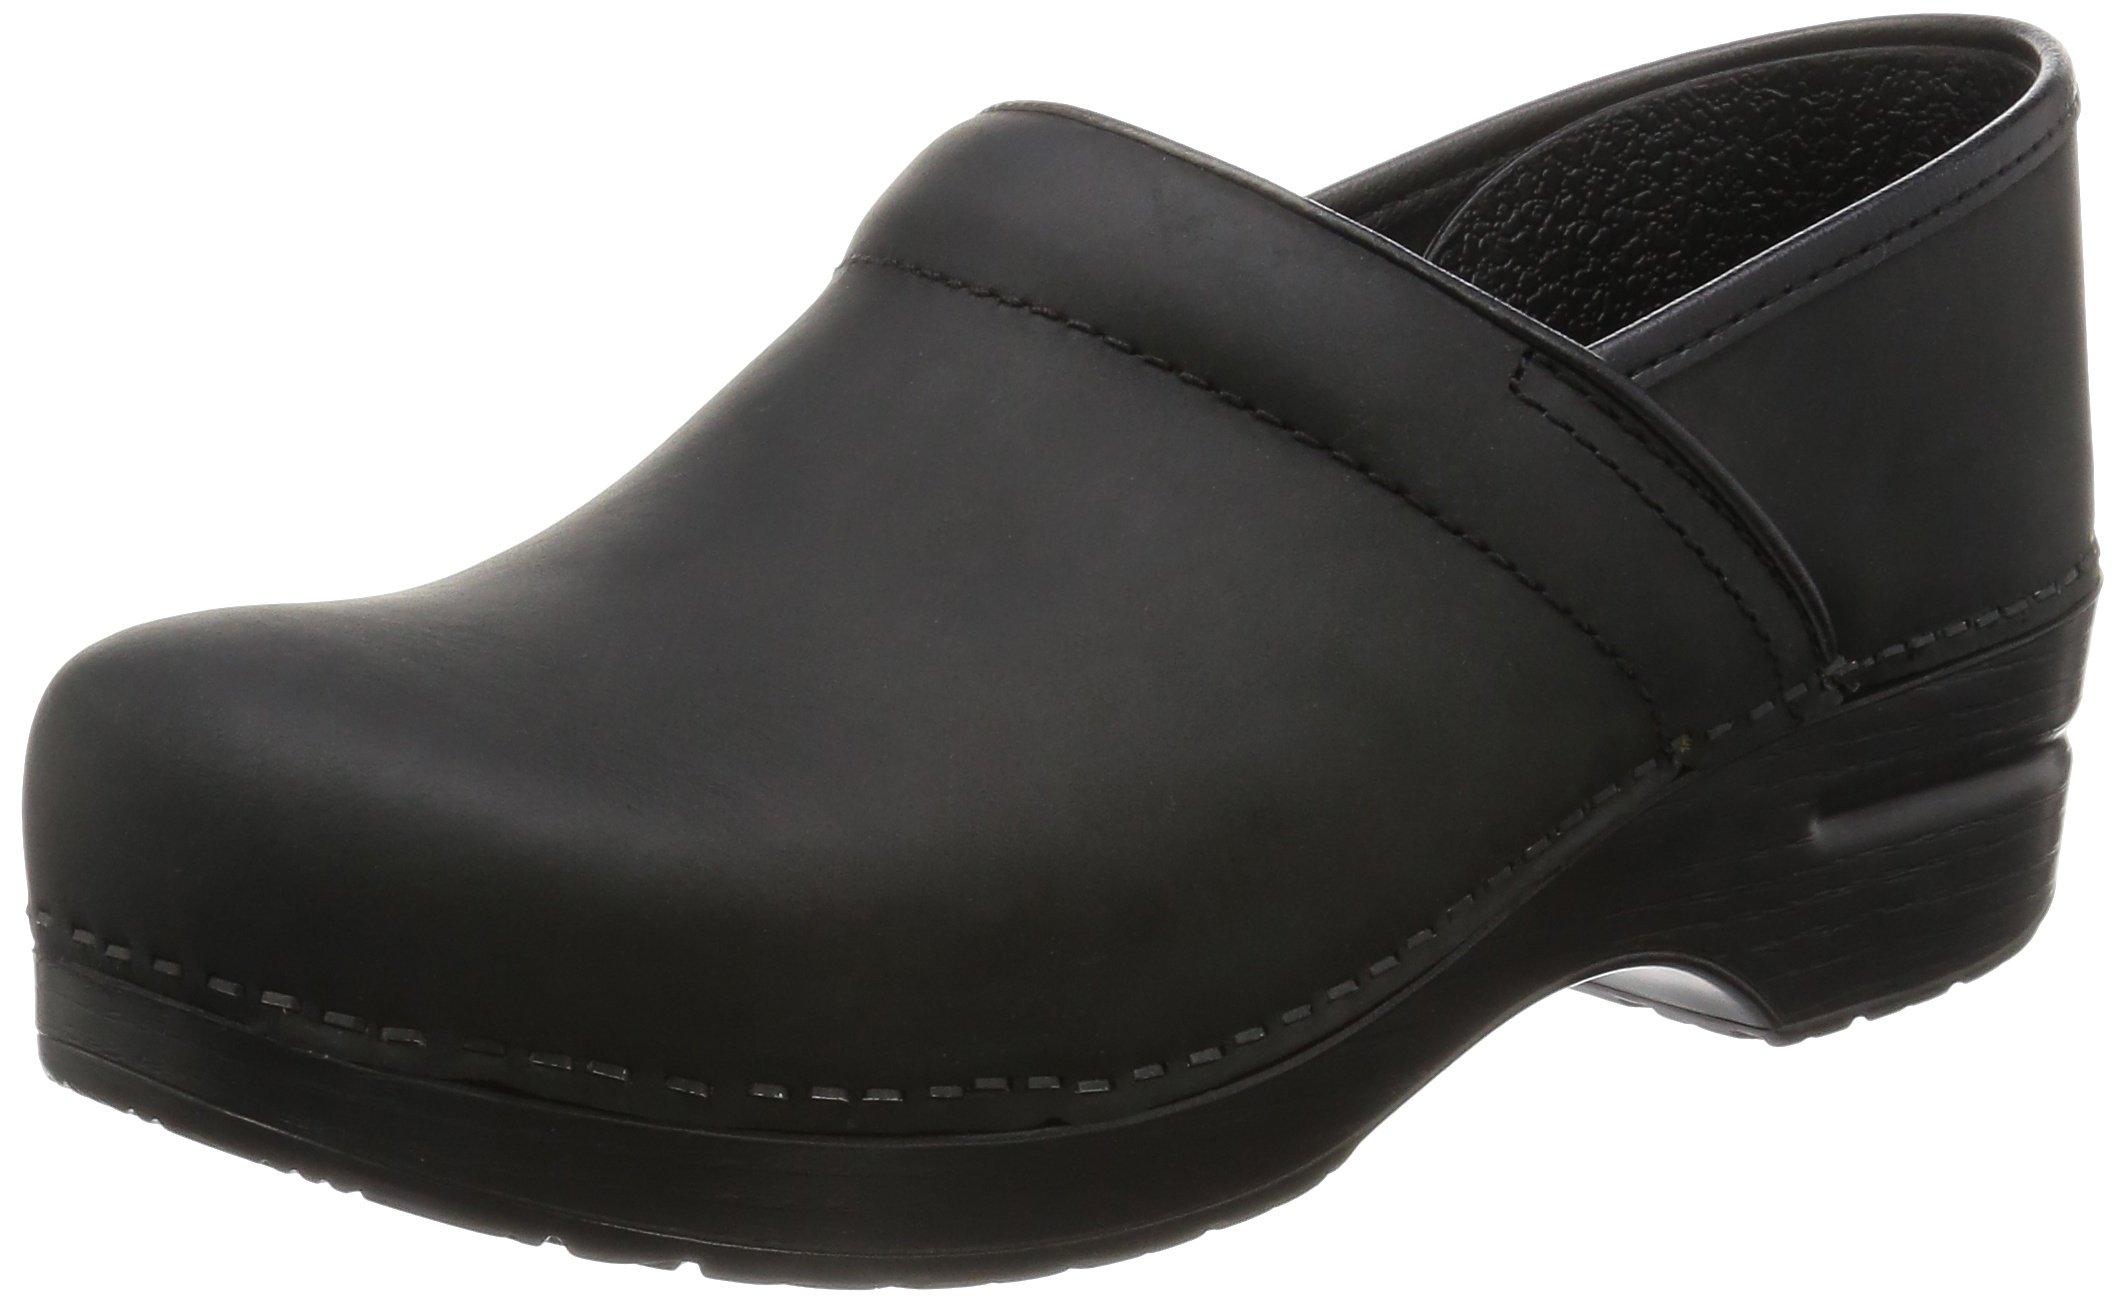 Dansko Professional Leather, Black Oiled, 44 (US Men's 10.5-11) Regular by Dansko